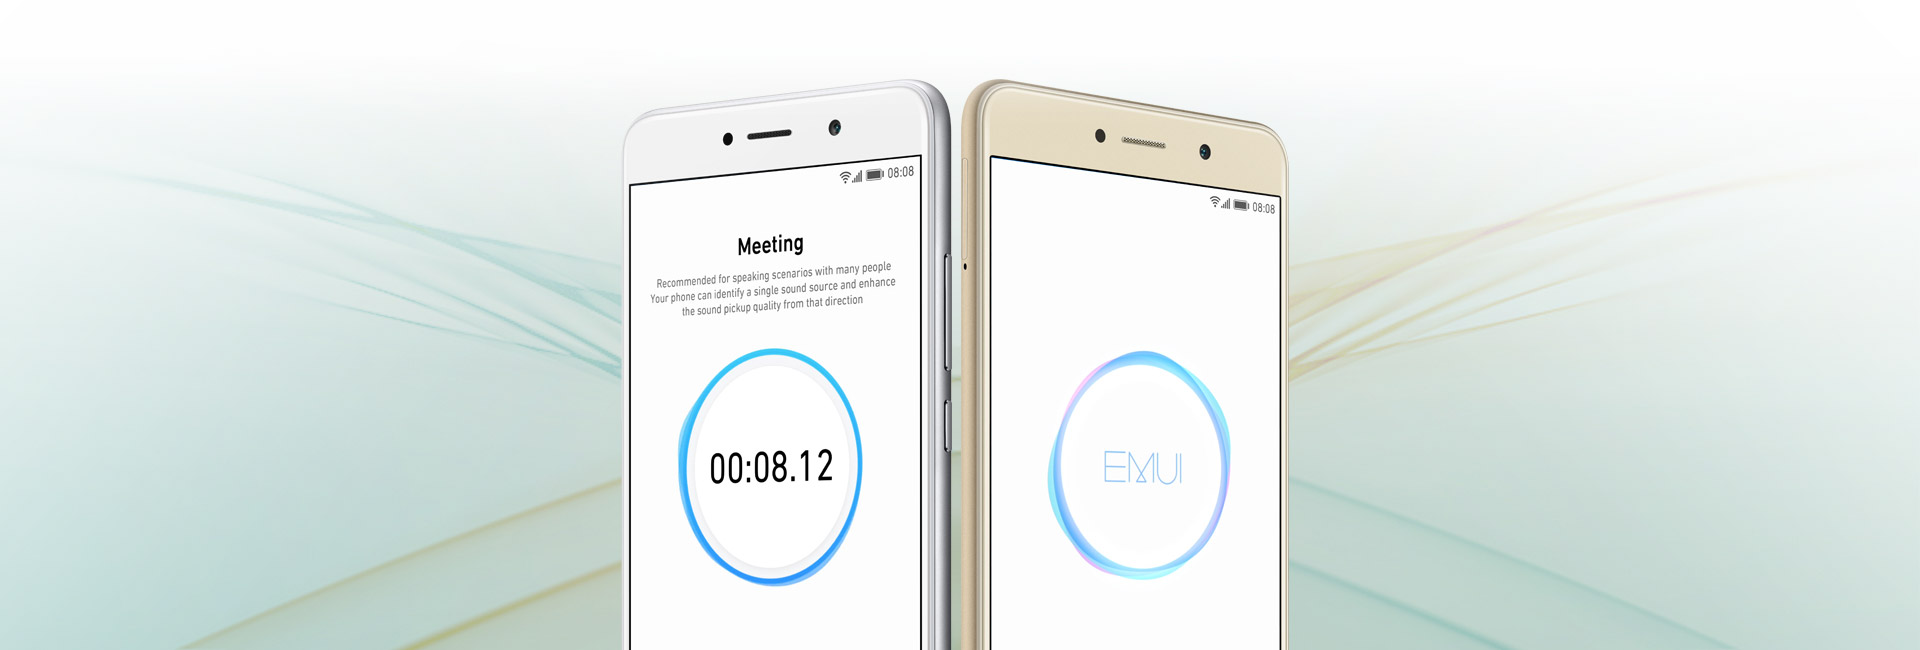 EMUI5.1, A Fresh New Experience